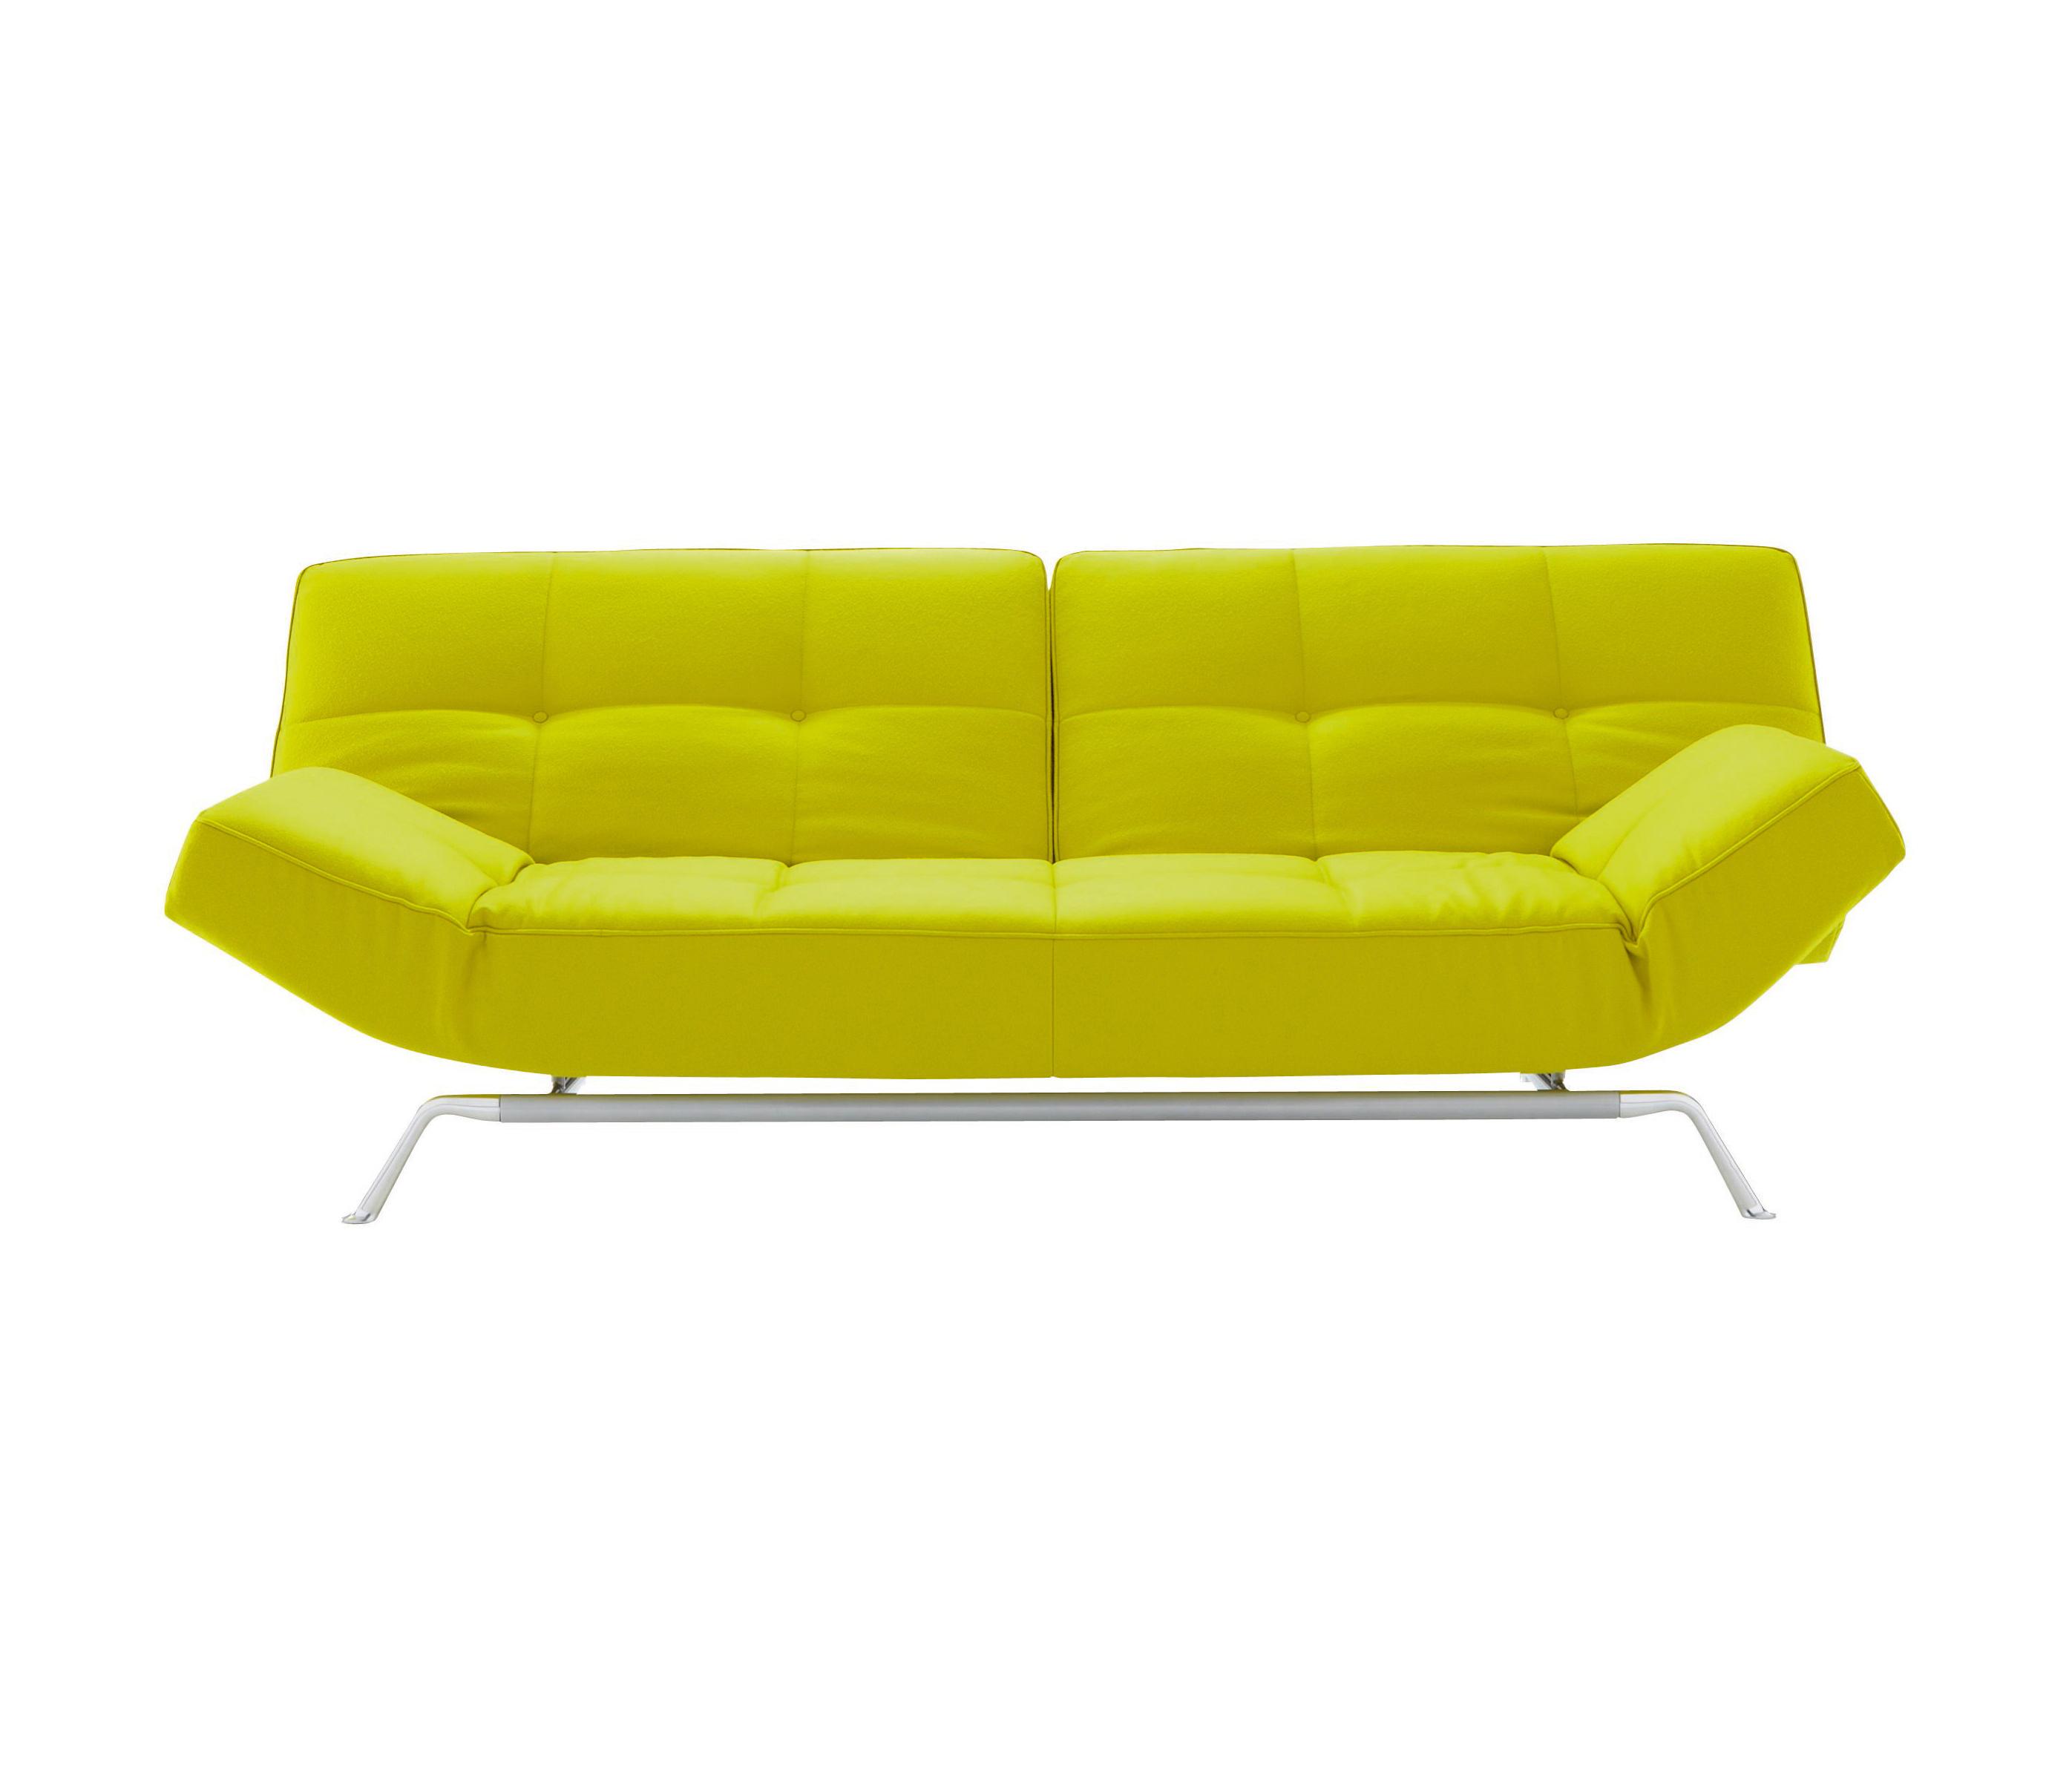 ligne roset sofa bed smala sofas from designer pascal mourgue ligne roset official site thesofa. Black Bedroom Furniture Sets. Home Design Ideas